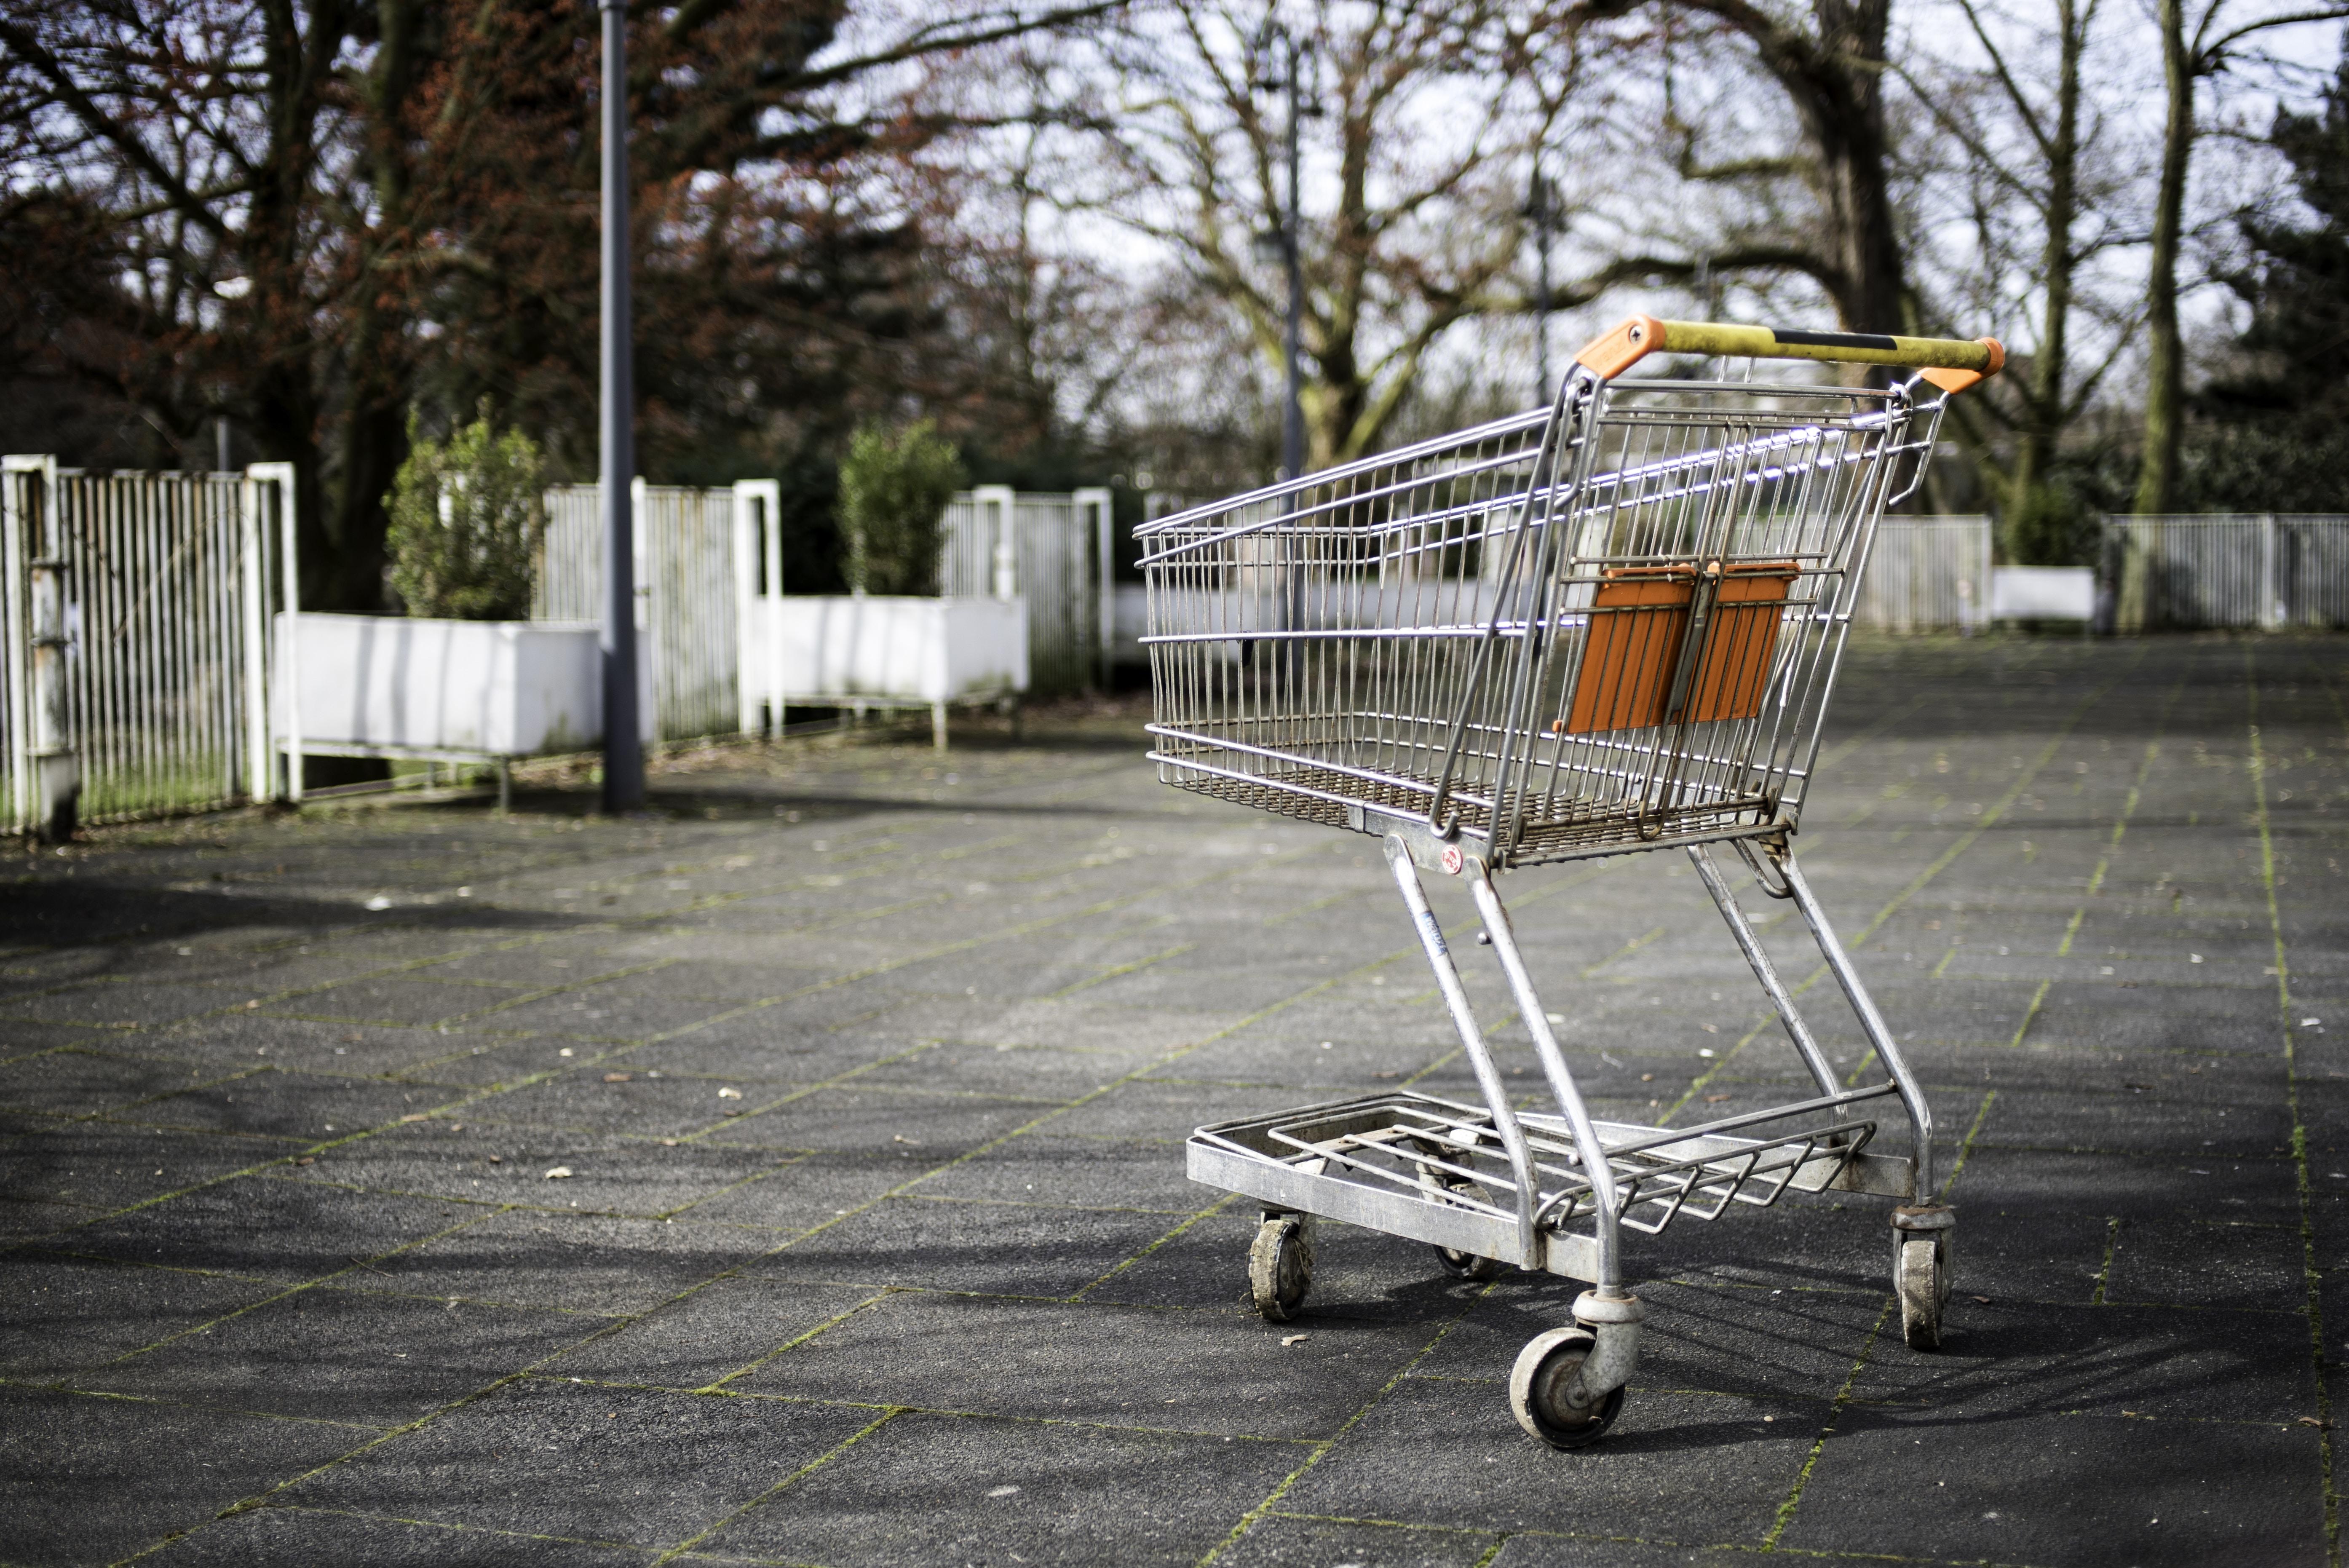 silver metal shopping cart on gray pavement near white fences